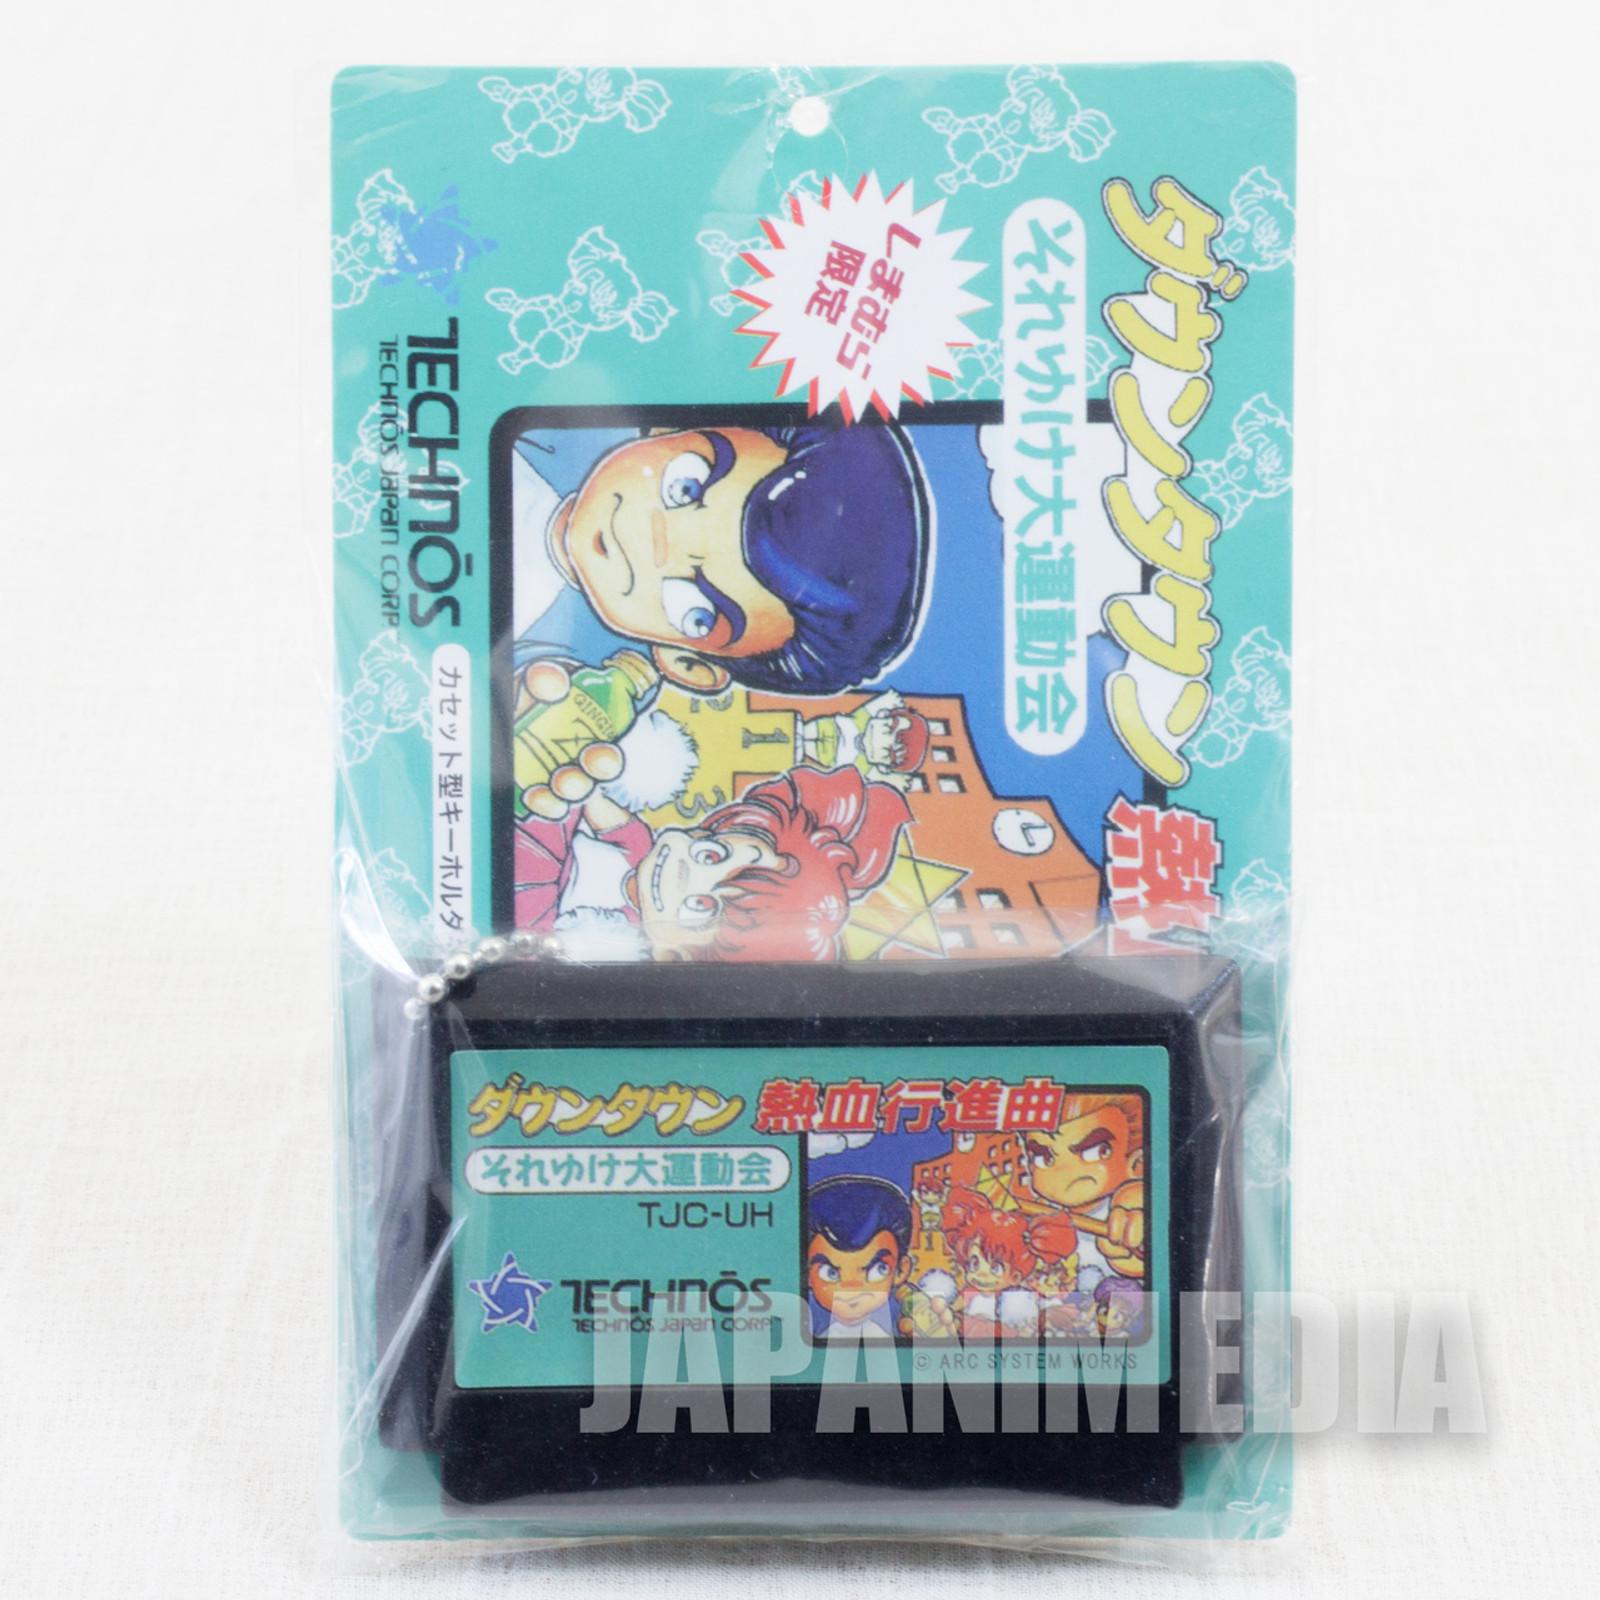 Down Town Nekketsu Monogatari Famicom Cassette Type Miniature Figure Ballchain